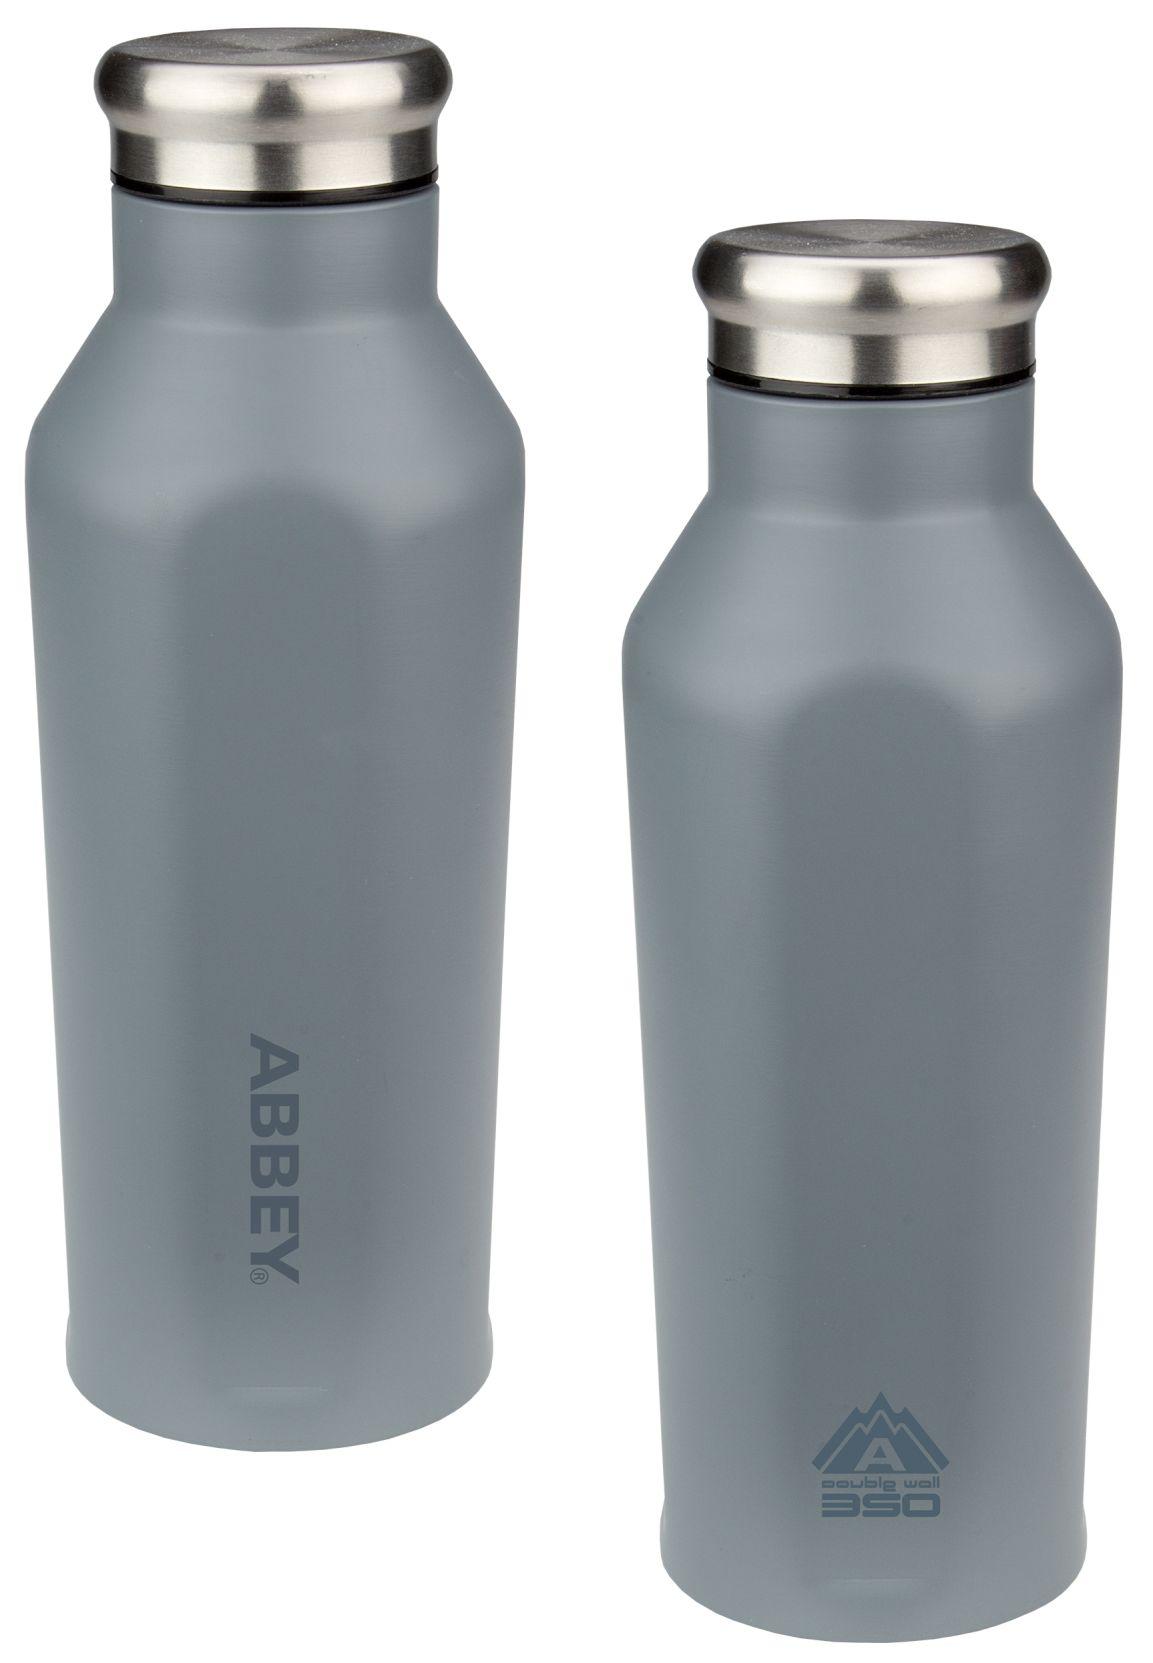 Drinkfles Dubbelwandig Godafoss • 0.35 Liter •